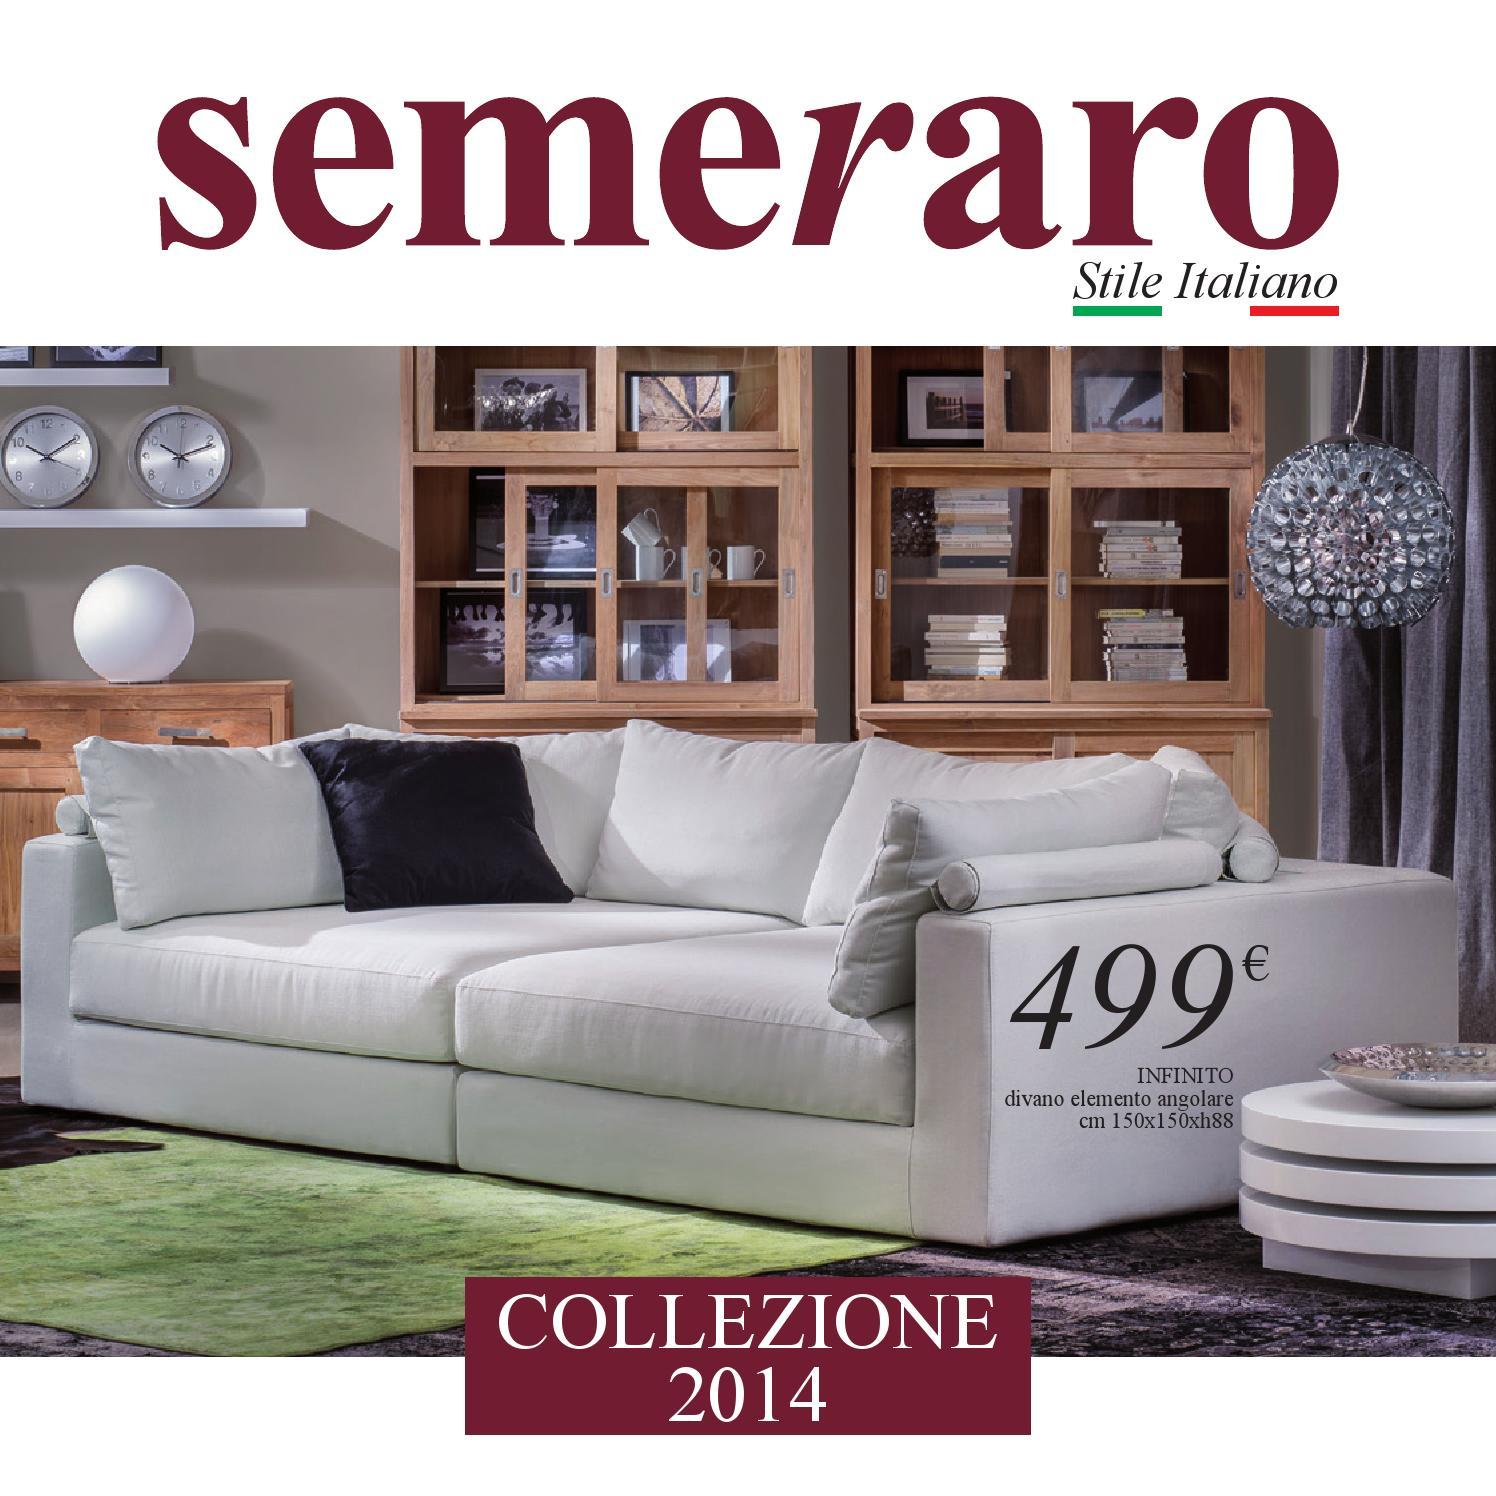 Catalogo semeraro 04 2014 by OVVIO  Issuu